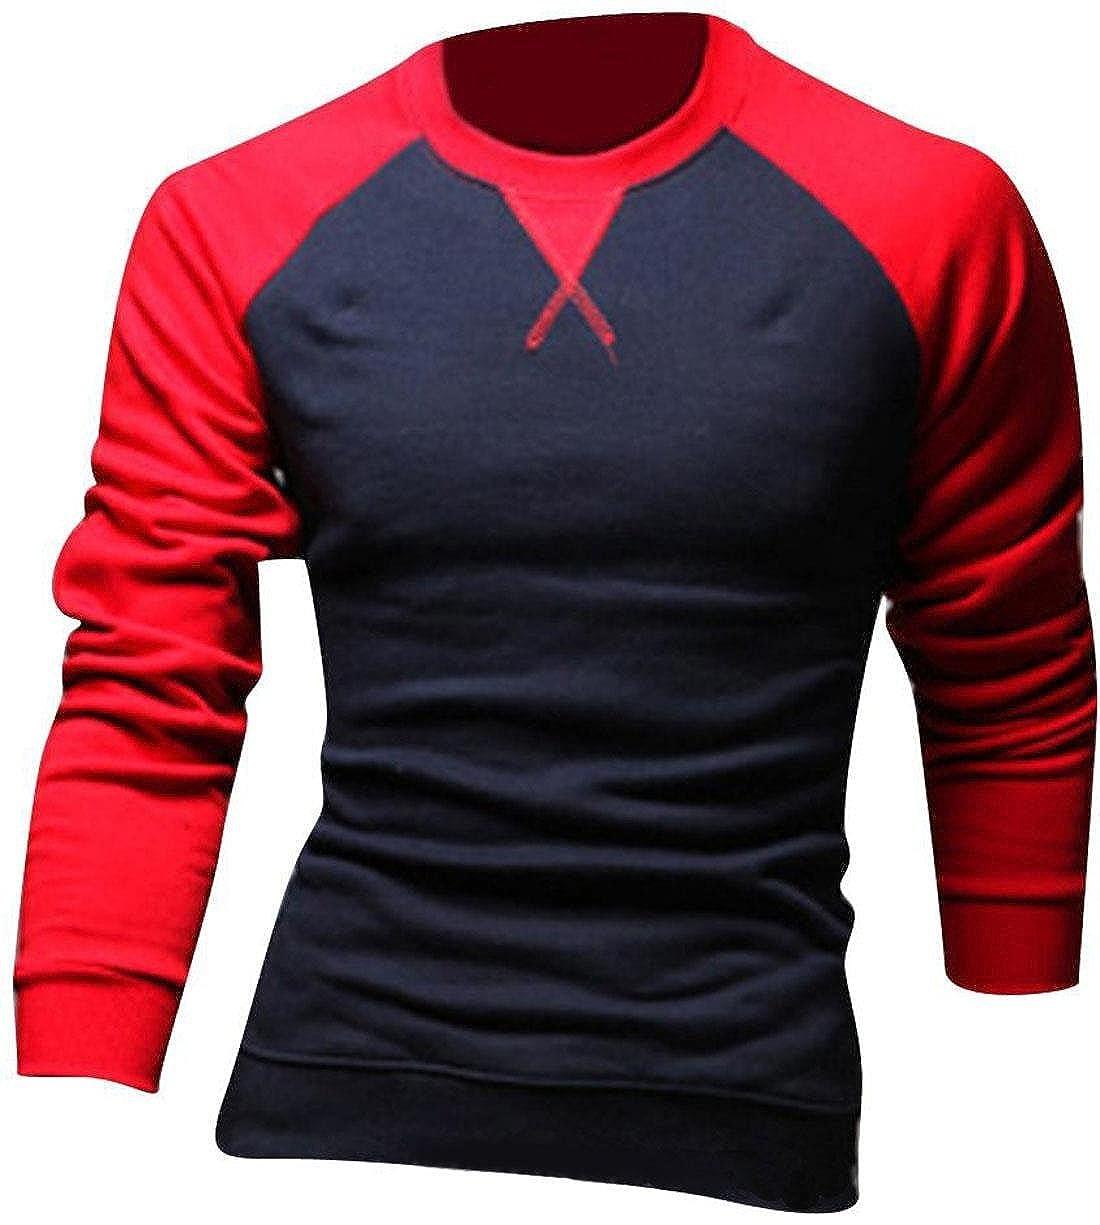 Jeansian Hombres Casual Slim Fit Manga Larga Camisetas Cuello Redondo tee Tops Dress D346: Amazon.es: Ropa y accesorios